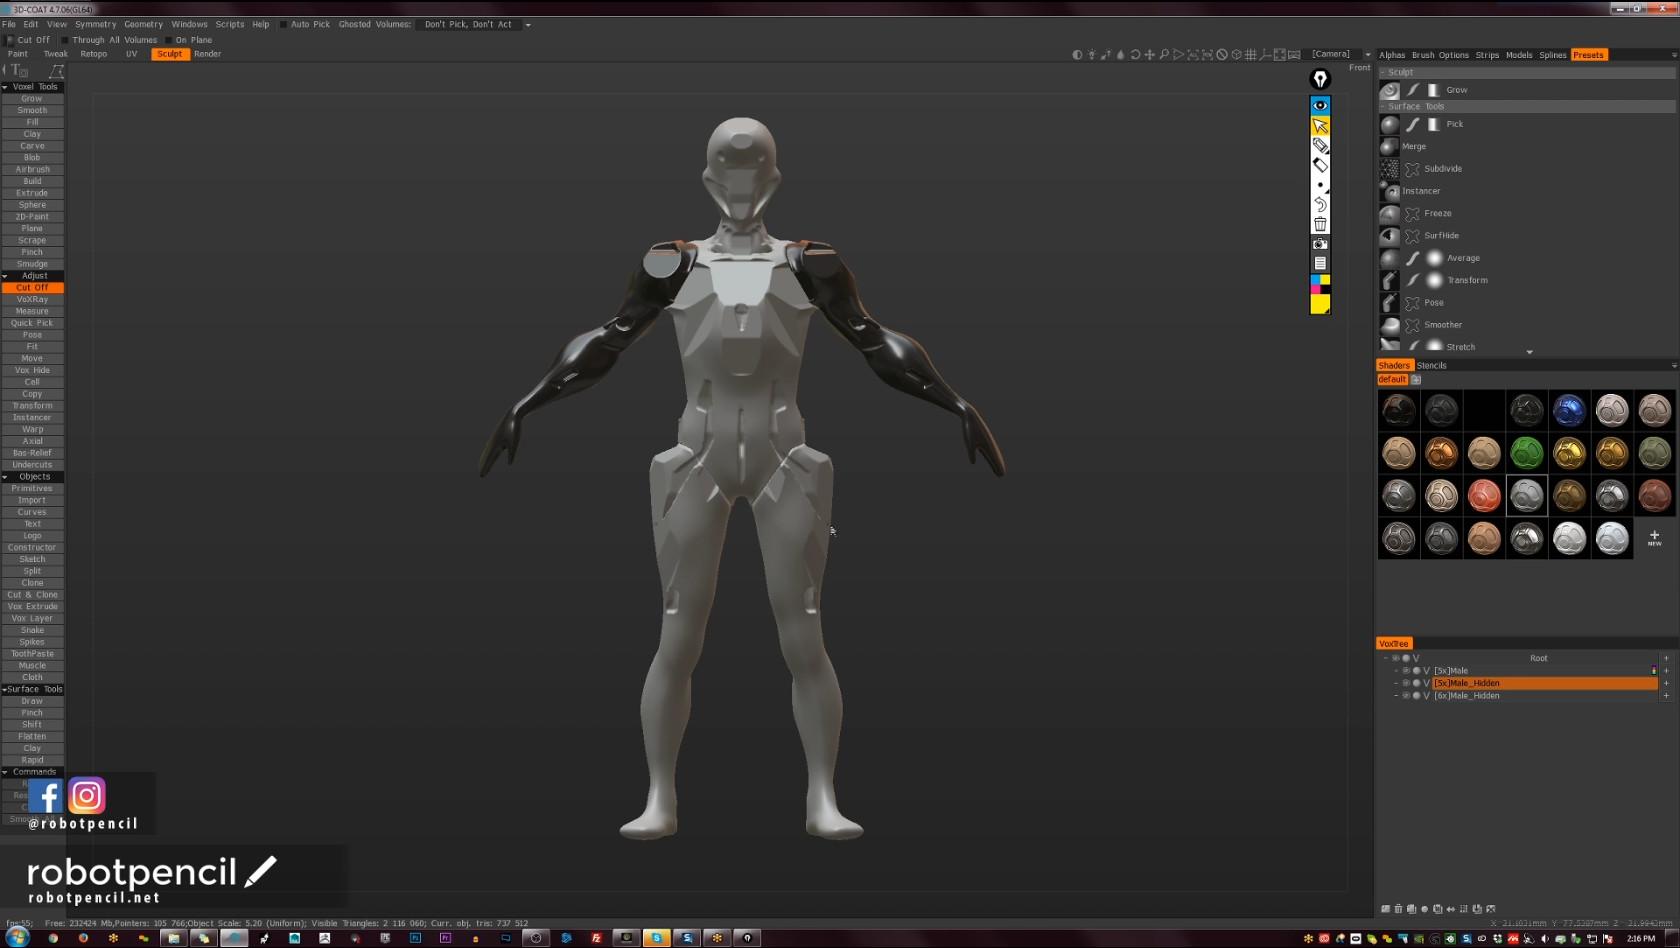 Robotpencil Presents: 3D Coat, Hard Surface Character